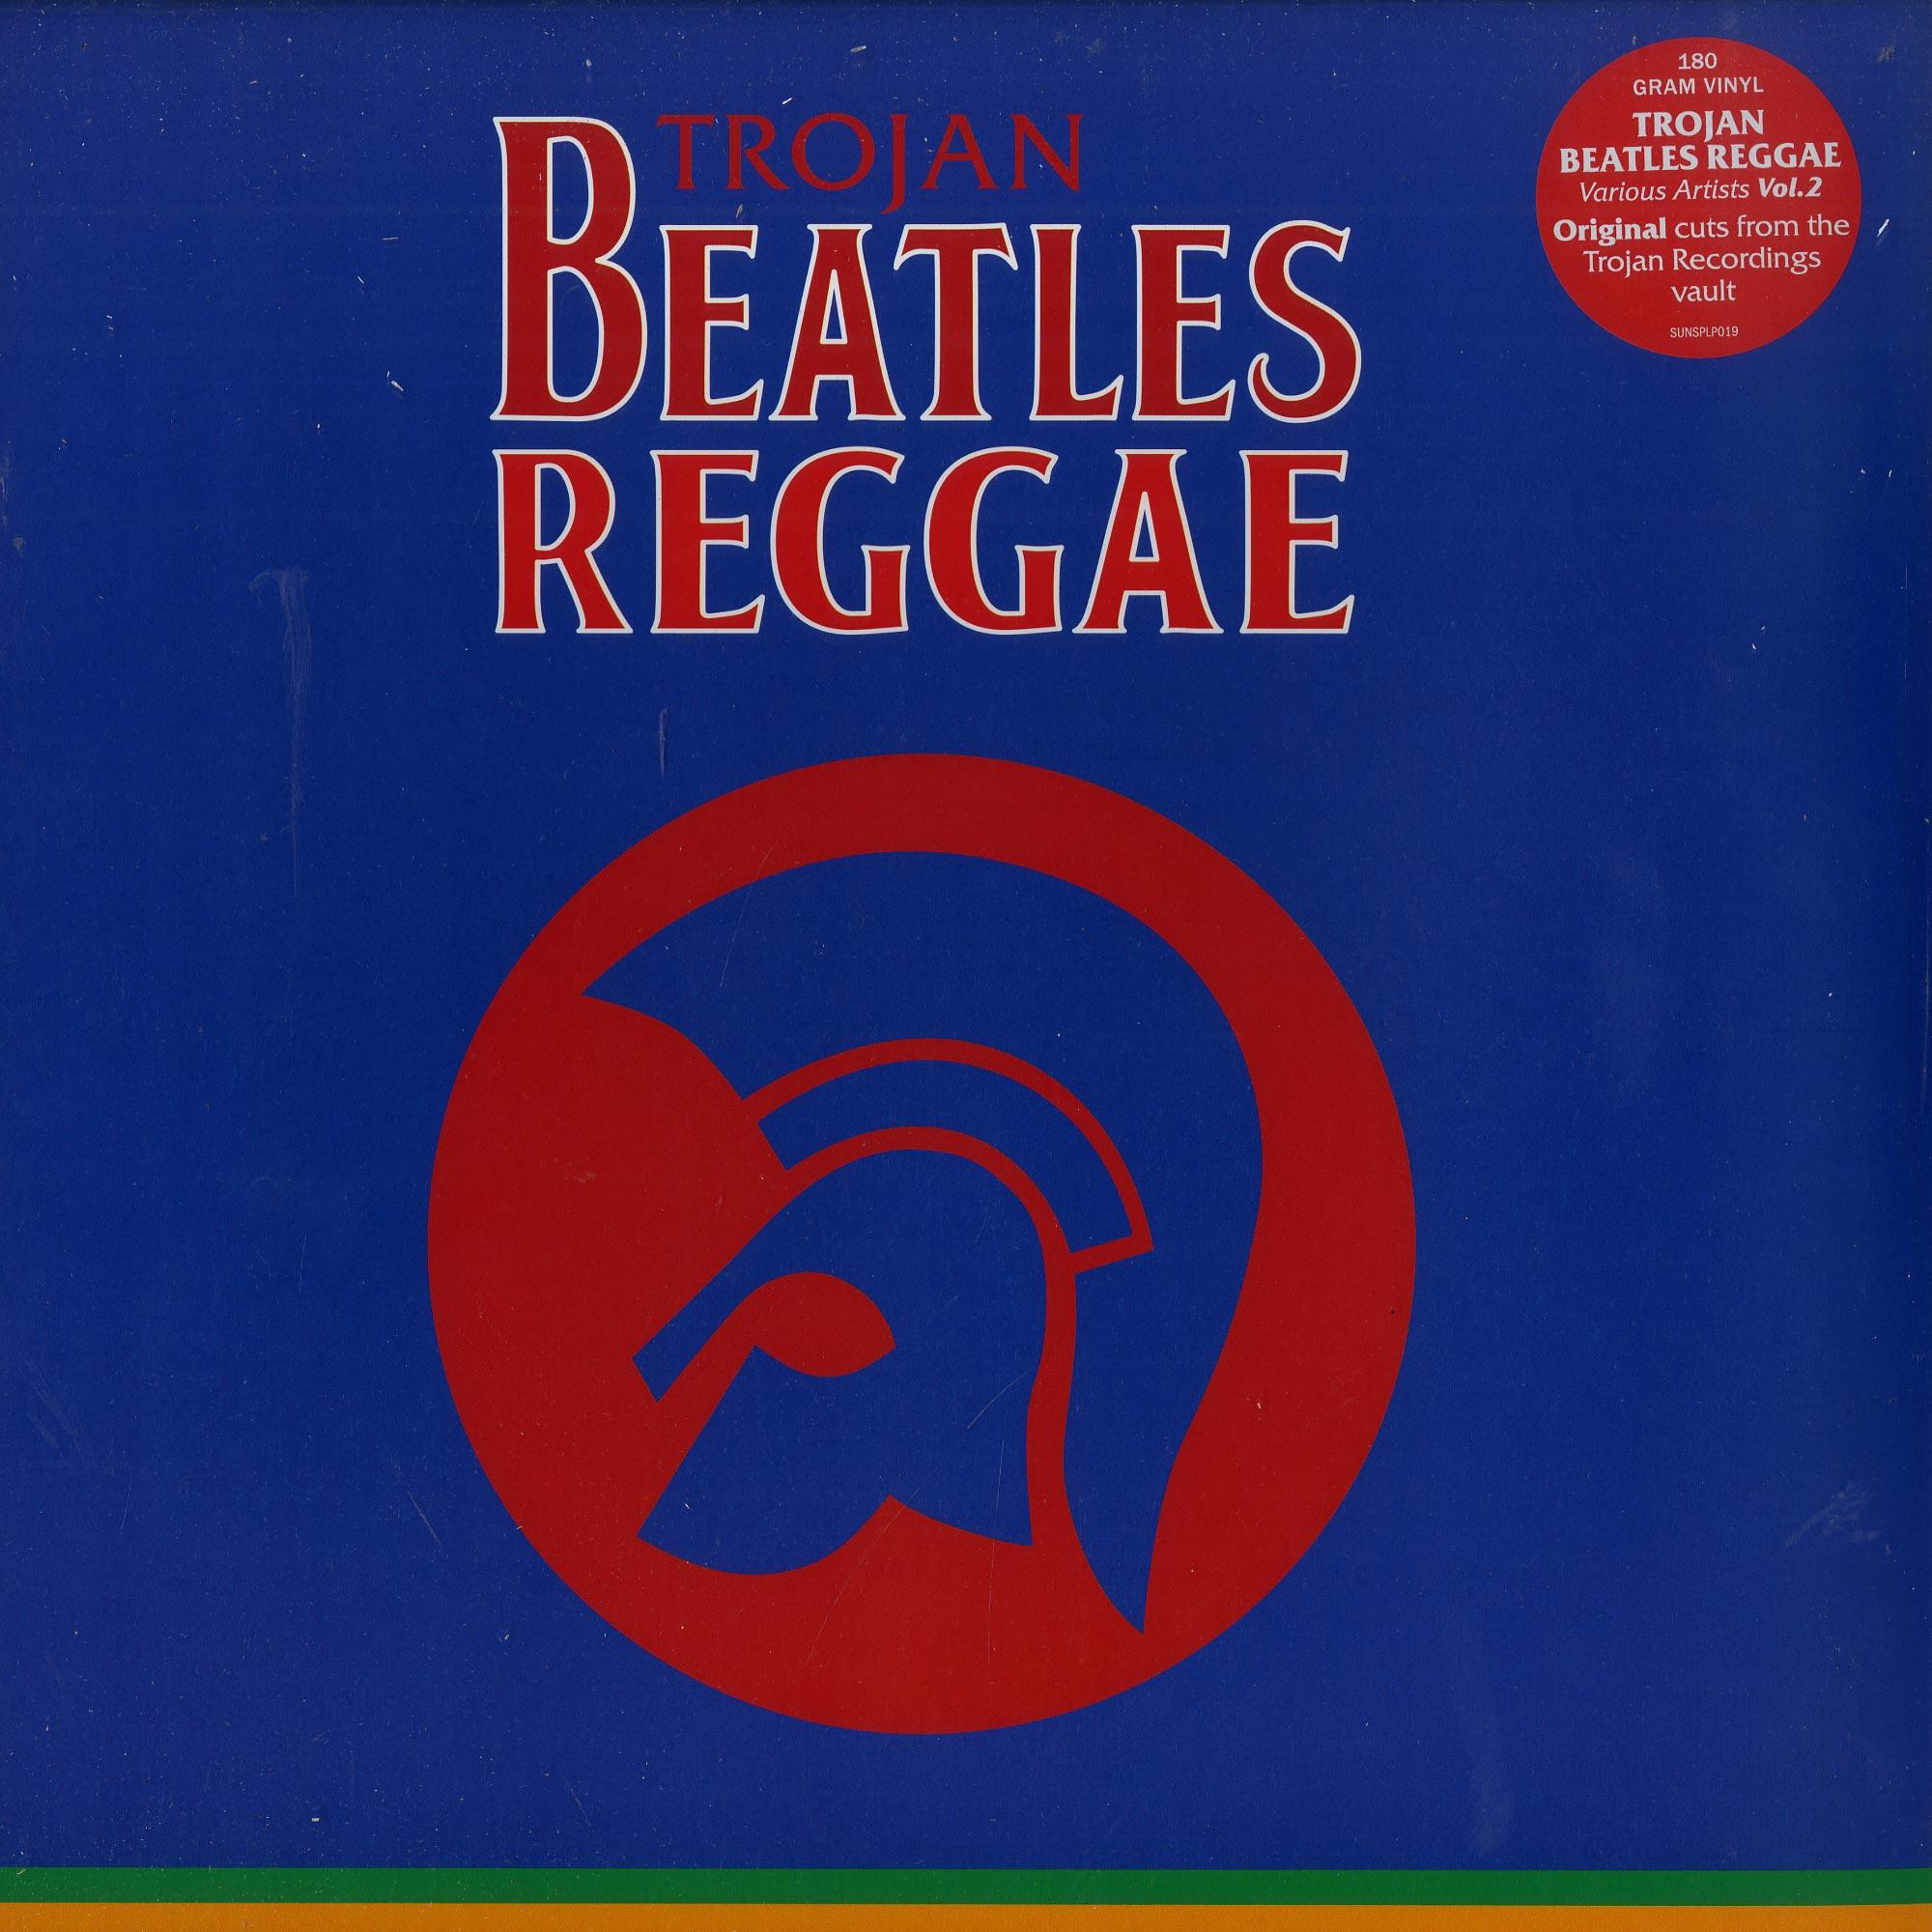 Various Artists - TROJAN BEATLES REGGAE